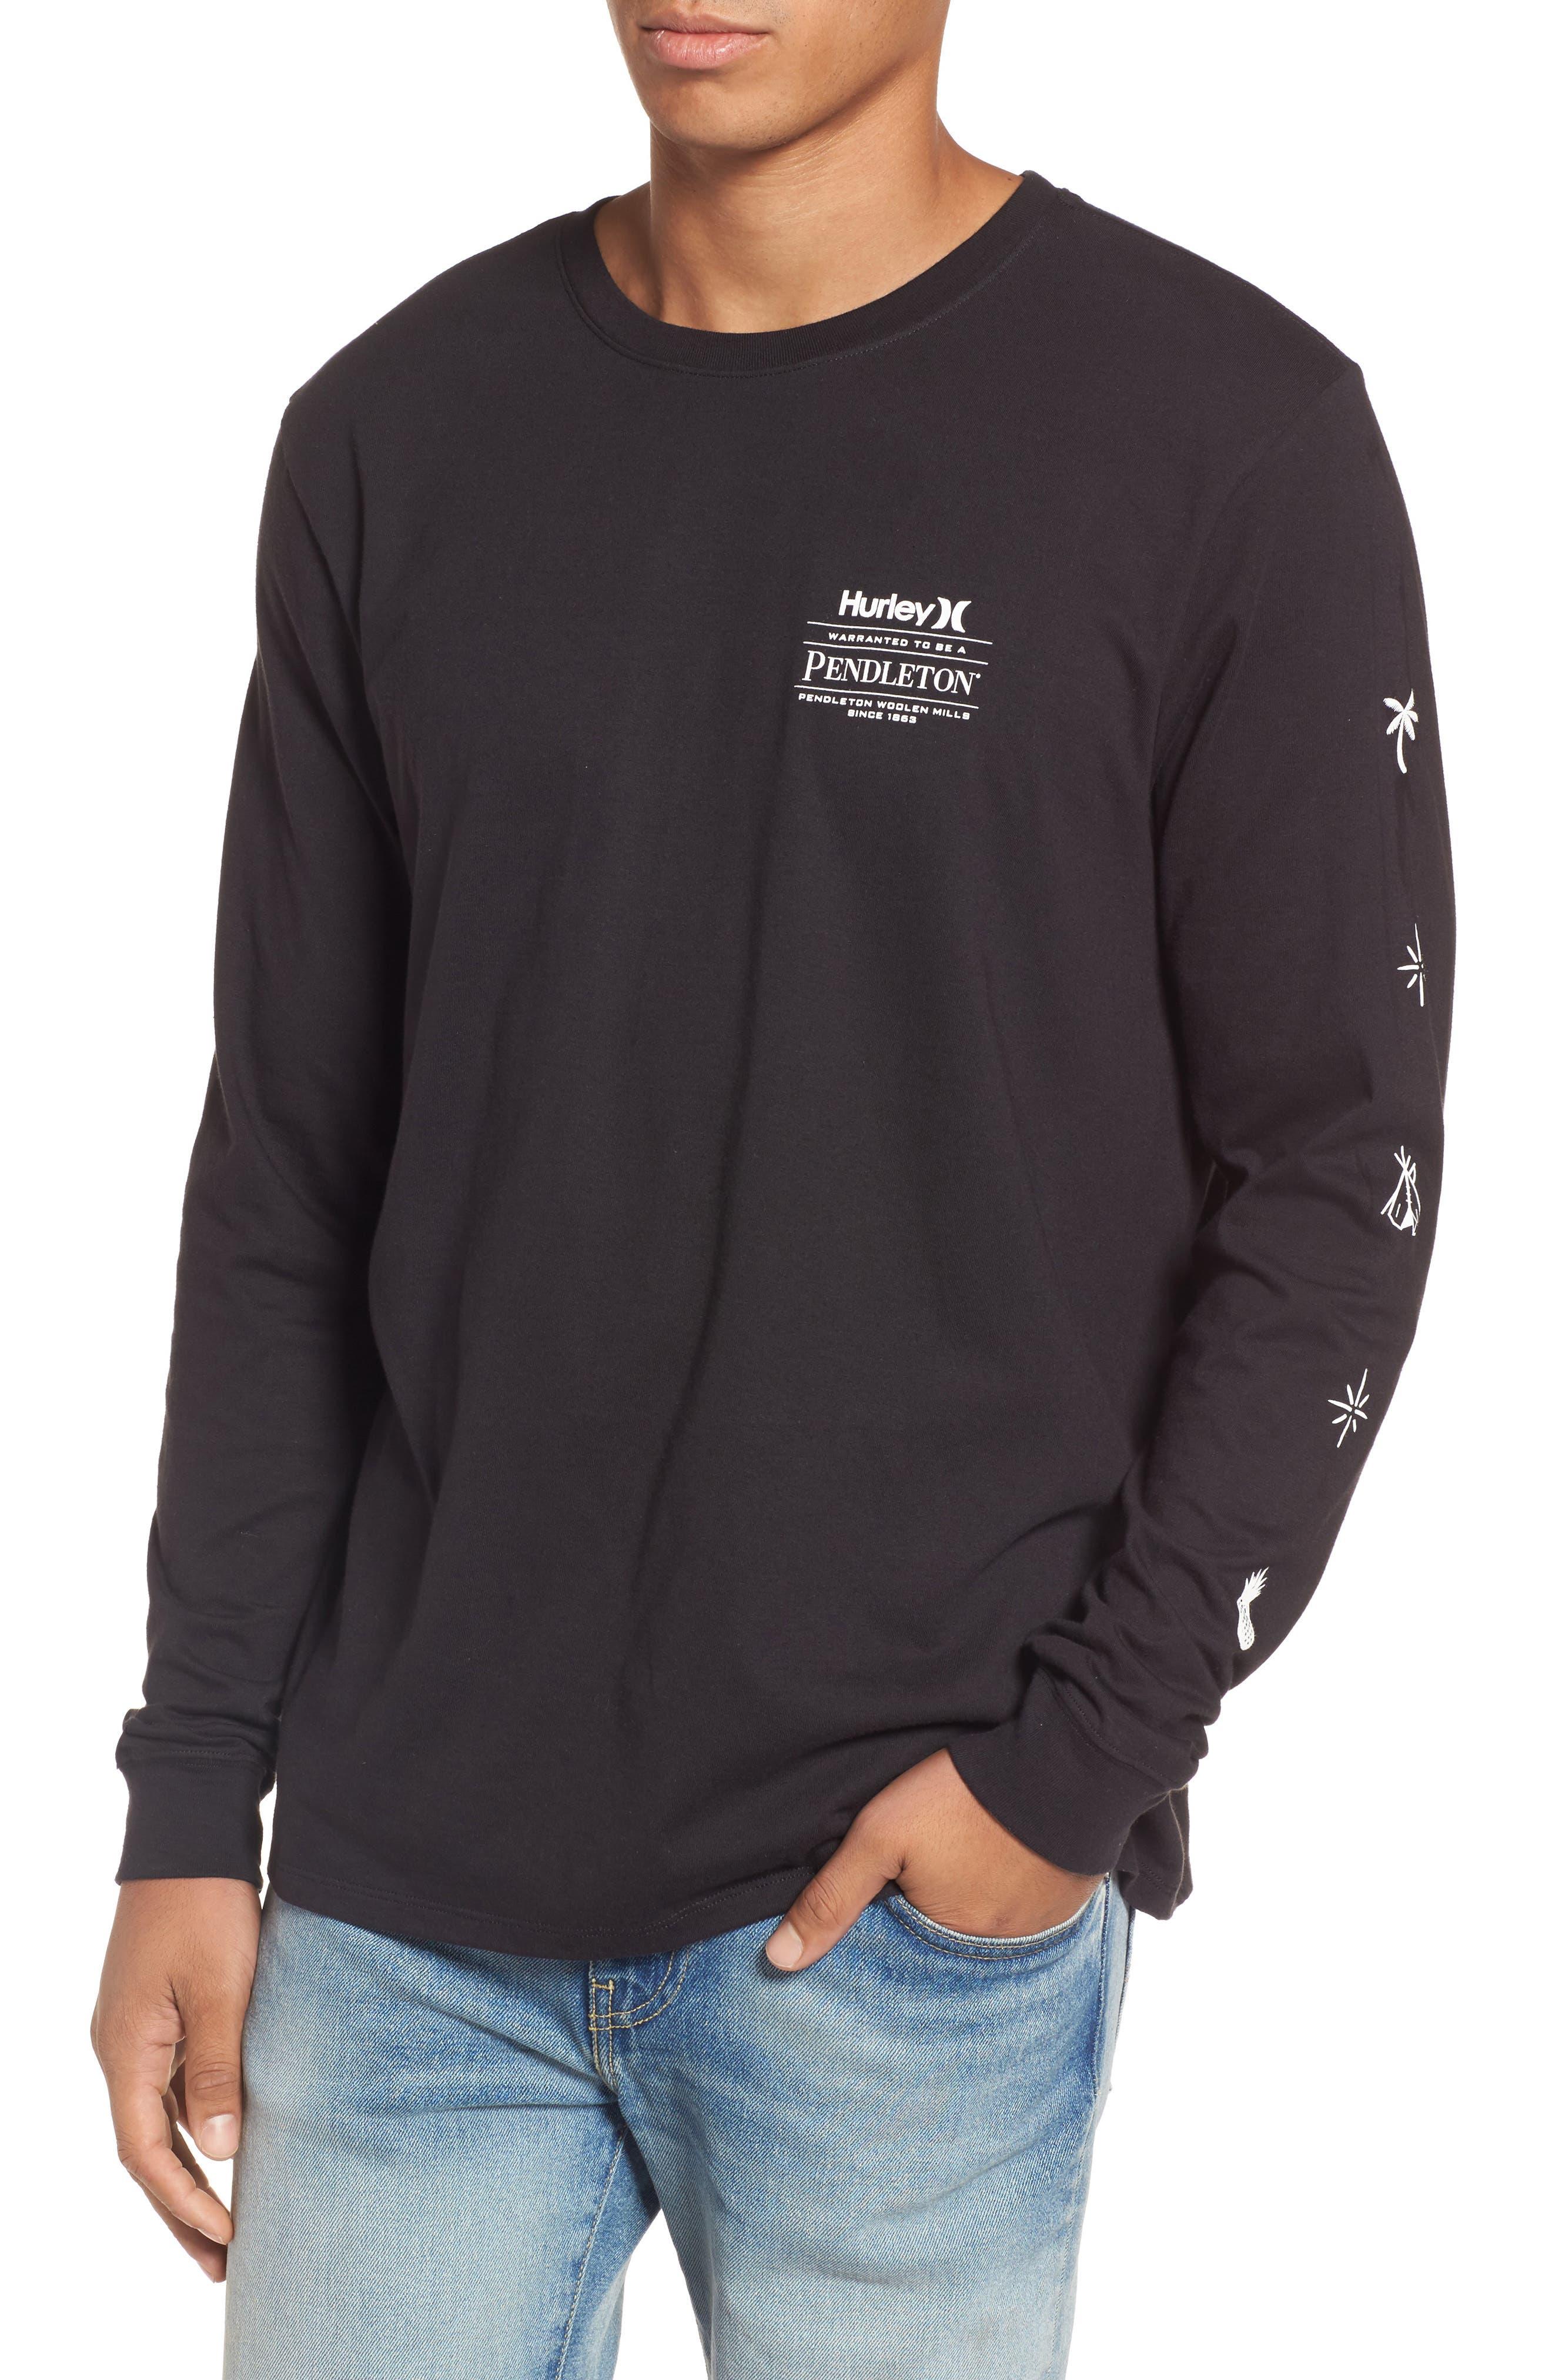 x Pendleton Long Sleeve T-Shirt,                         Main,                         color, 010